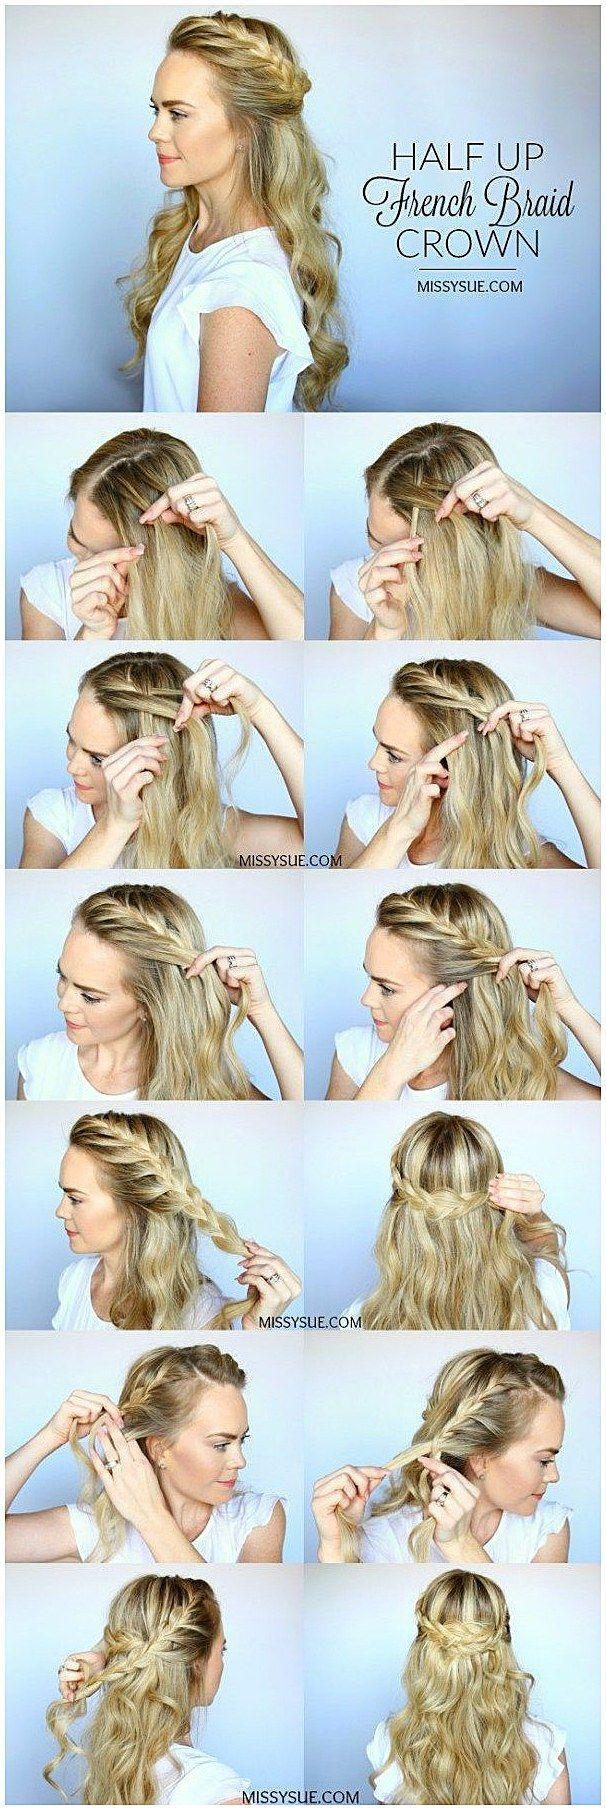 Half Up Frenc Braid Crown Hair Tutorial Simplebraidedhair